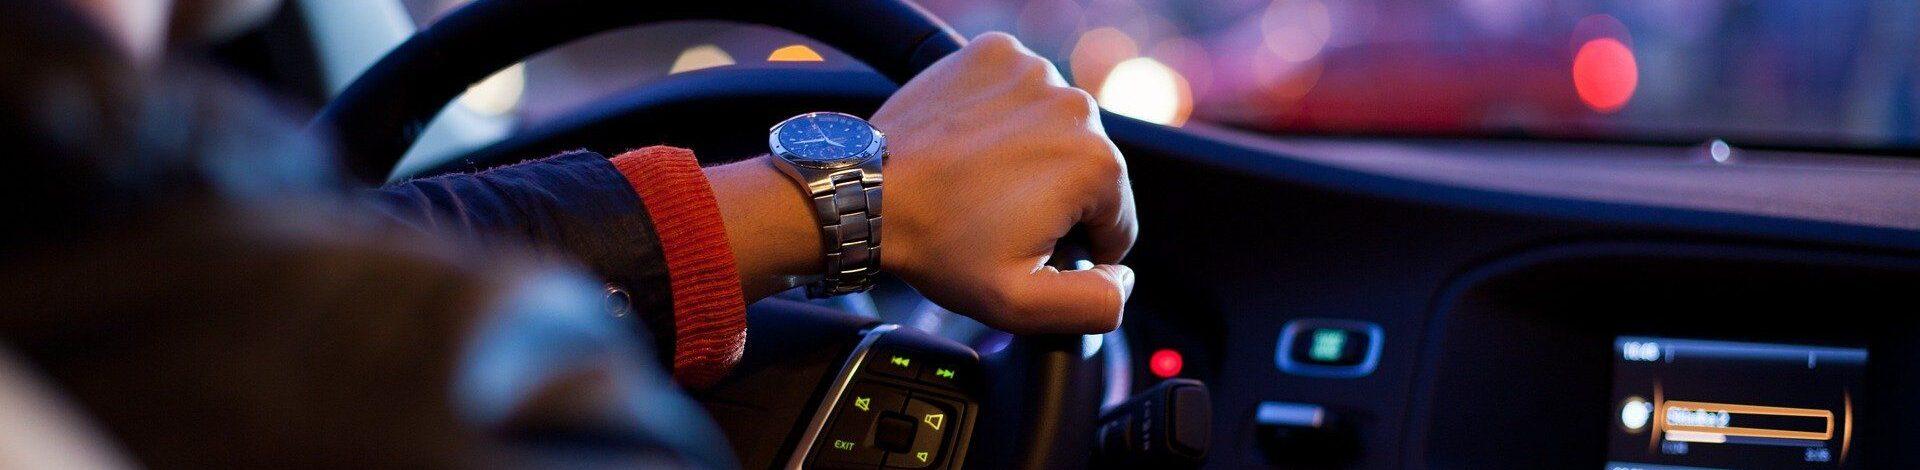 conducir-coche-gasolina-eficiente